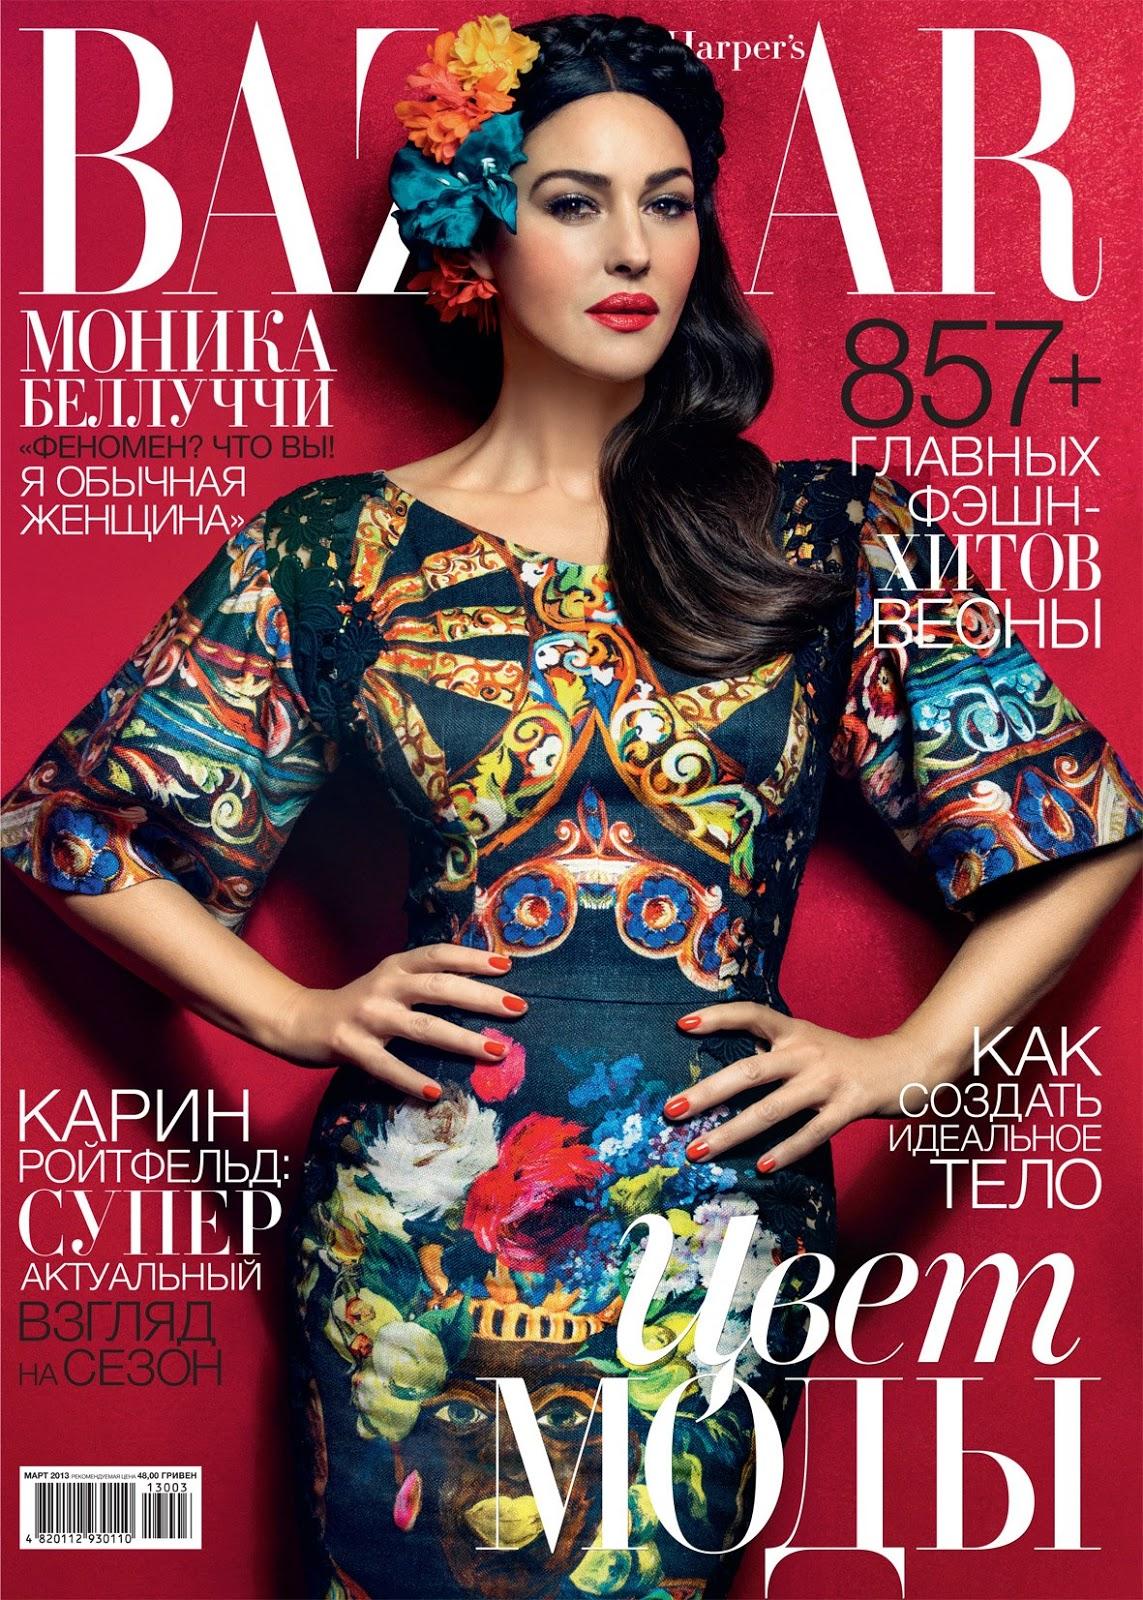 http://4.bp.blogspot.com/-bAnvzemashk/UUBL_ldShyI/AAAAAAABOCY/0hE_lYvHm8s/s1600/Harpers-Bazaar-Ukraine-March-2013-Monica-Bellucci-Magazine-Cover-by-Signe-Vilstrup.jpg